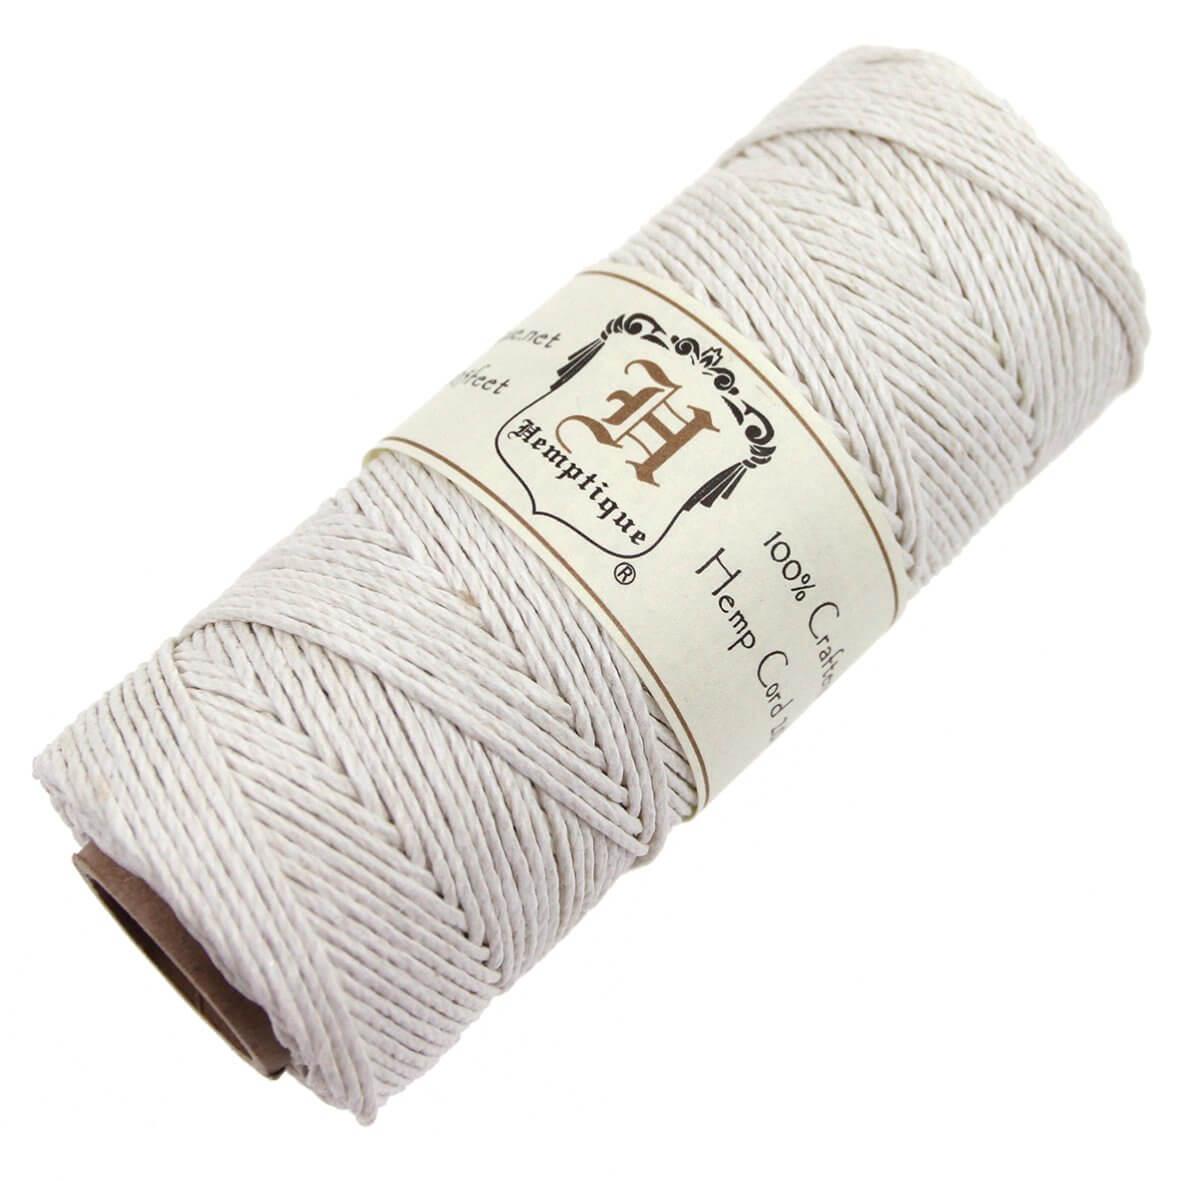 Hemptique Hemp Cord - White